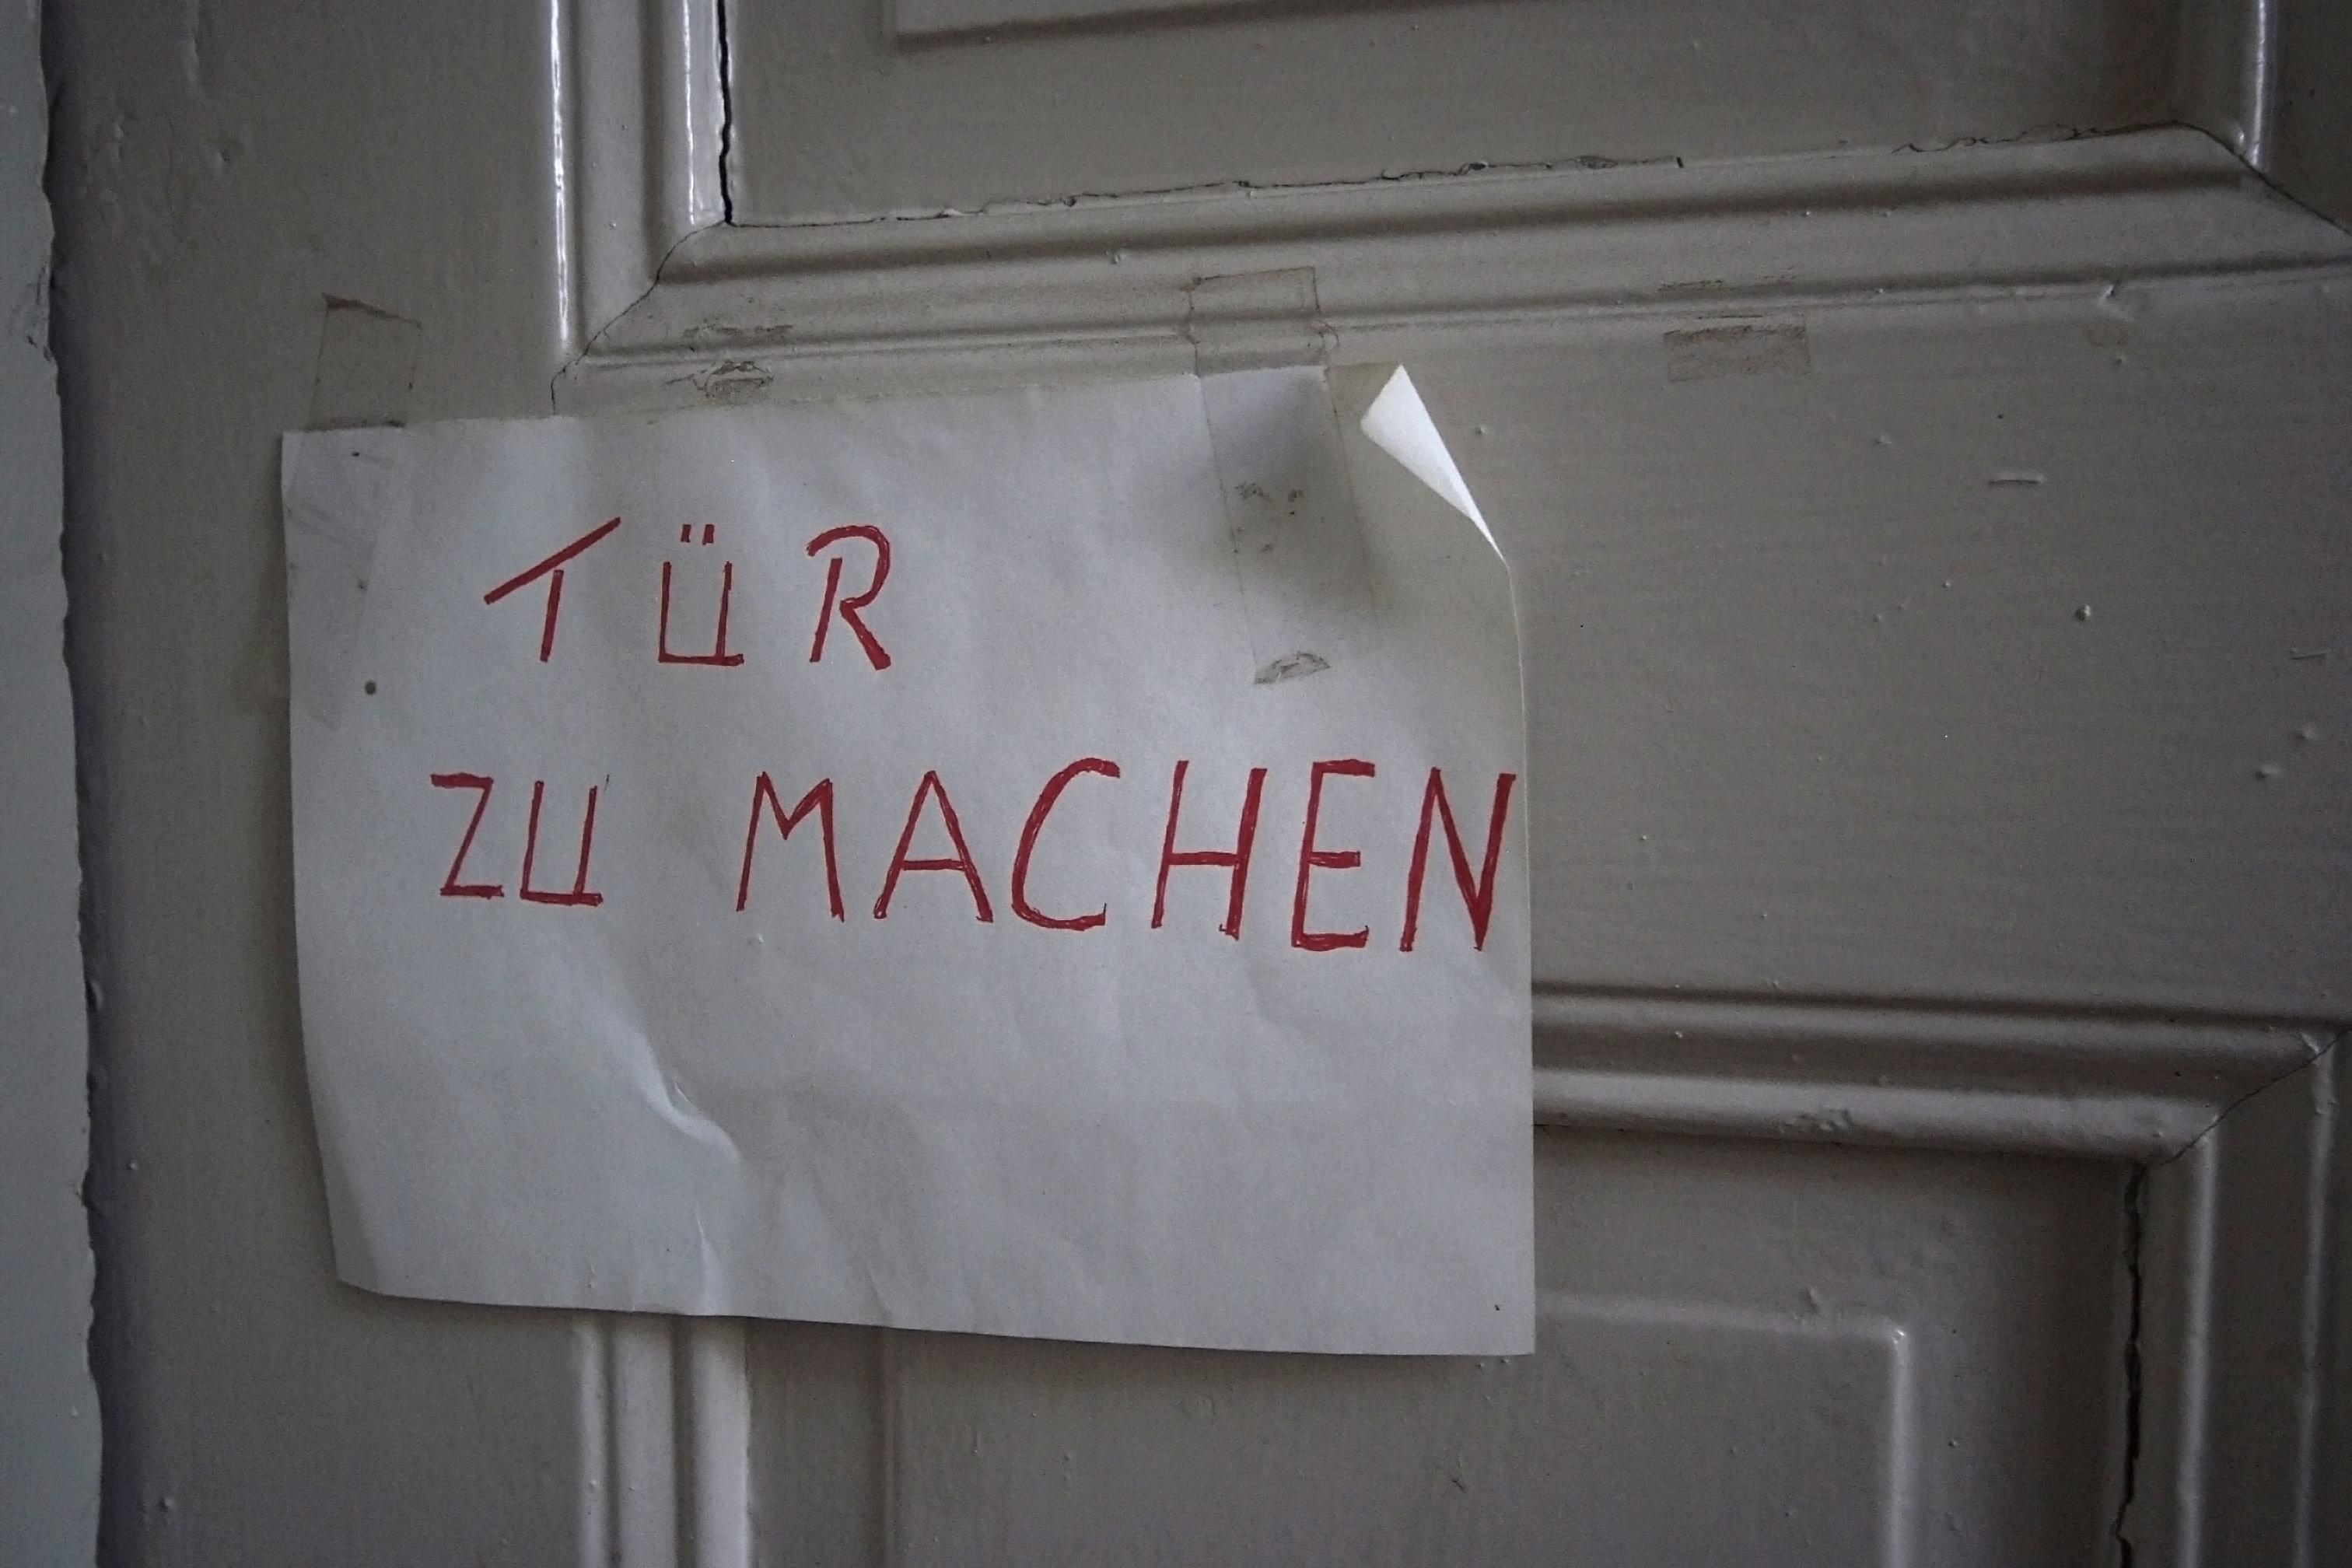 Tür zu tür  File:Tuer zu machen Bf Niederfinow.jpg - Wikimedia Commons